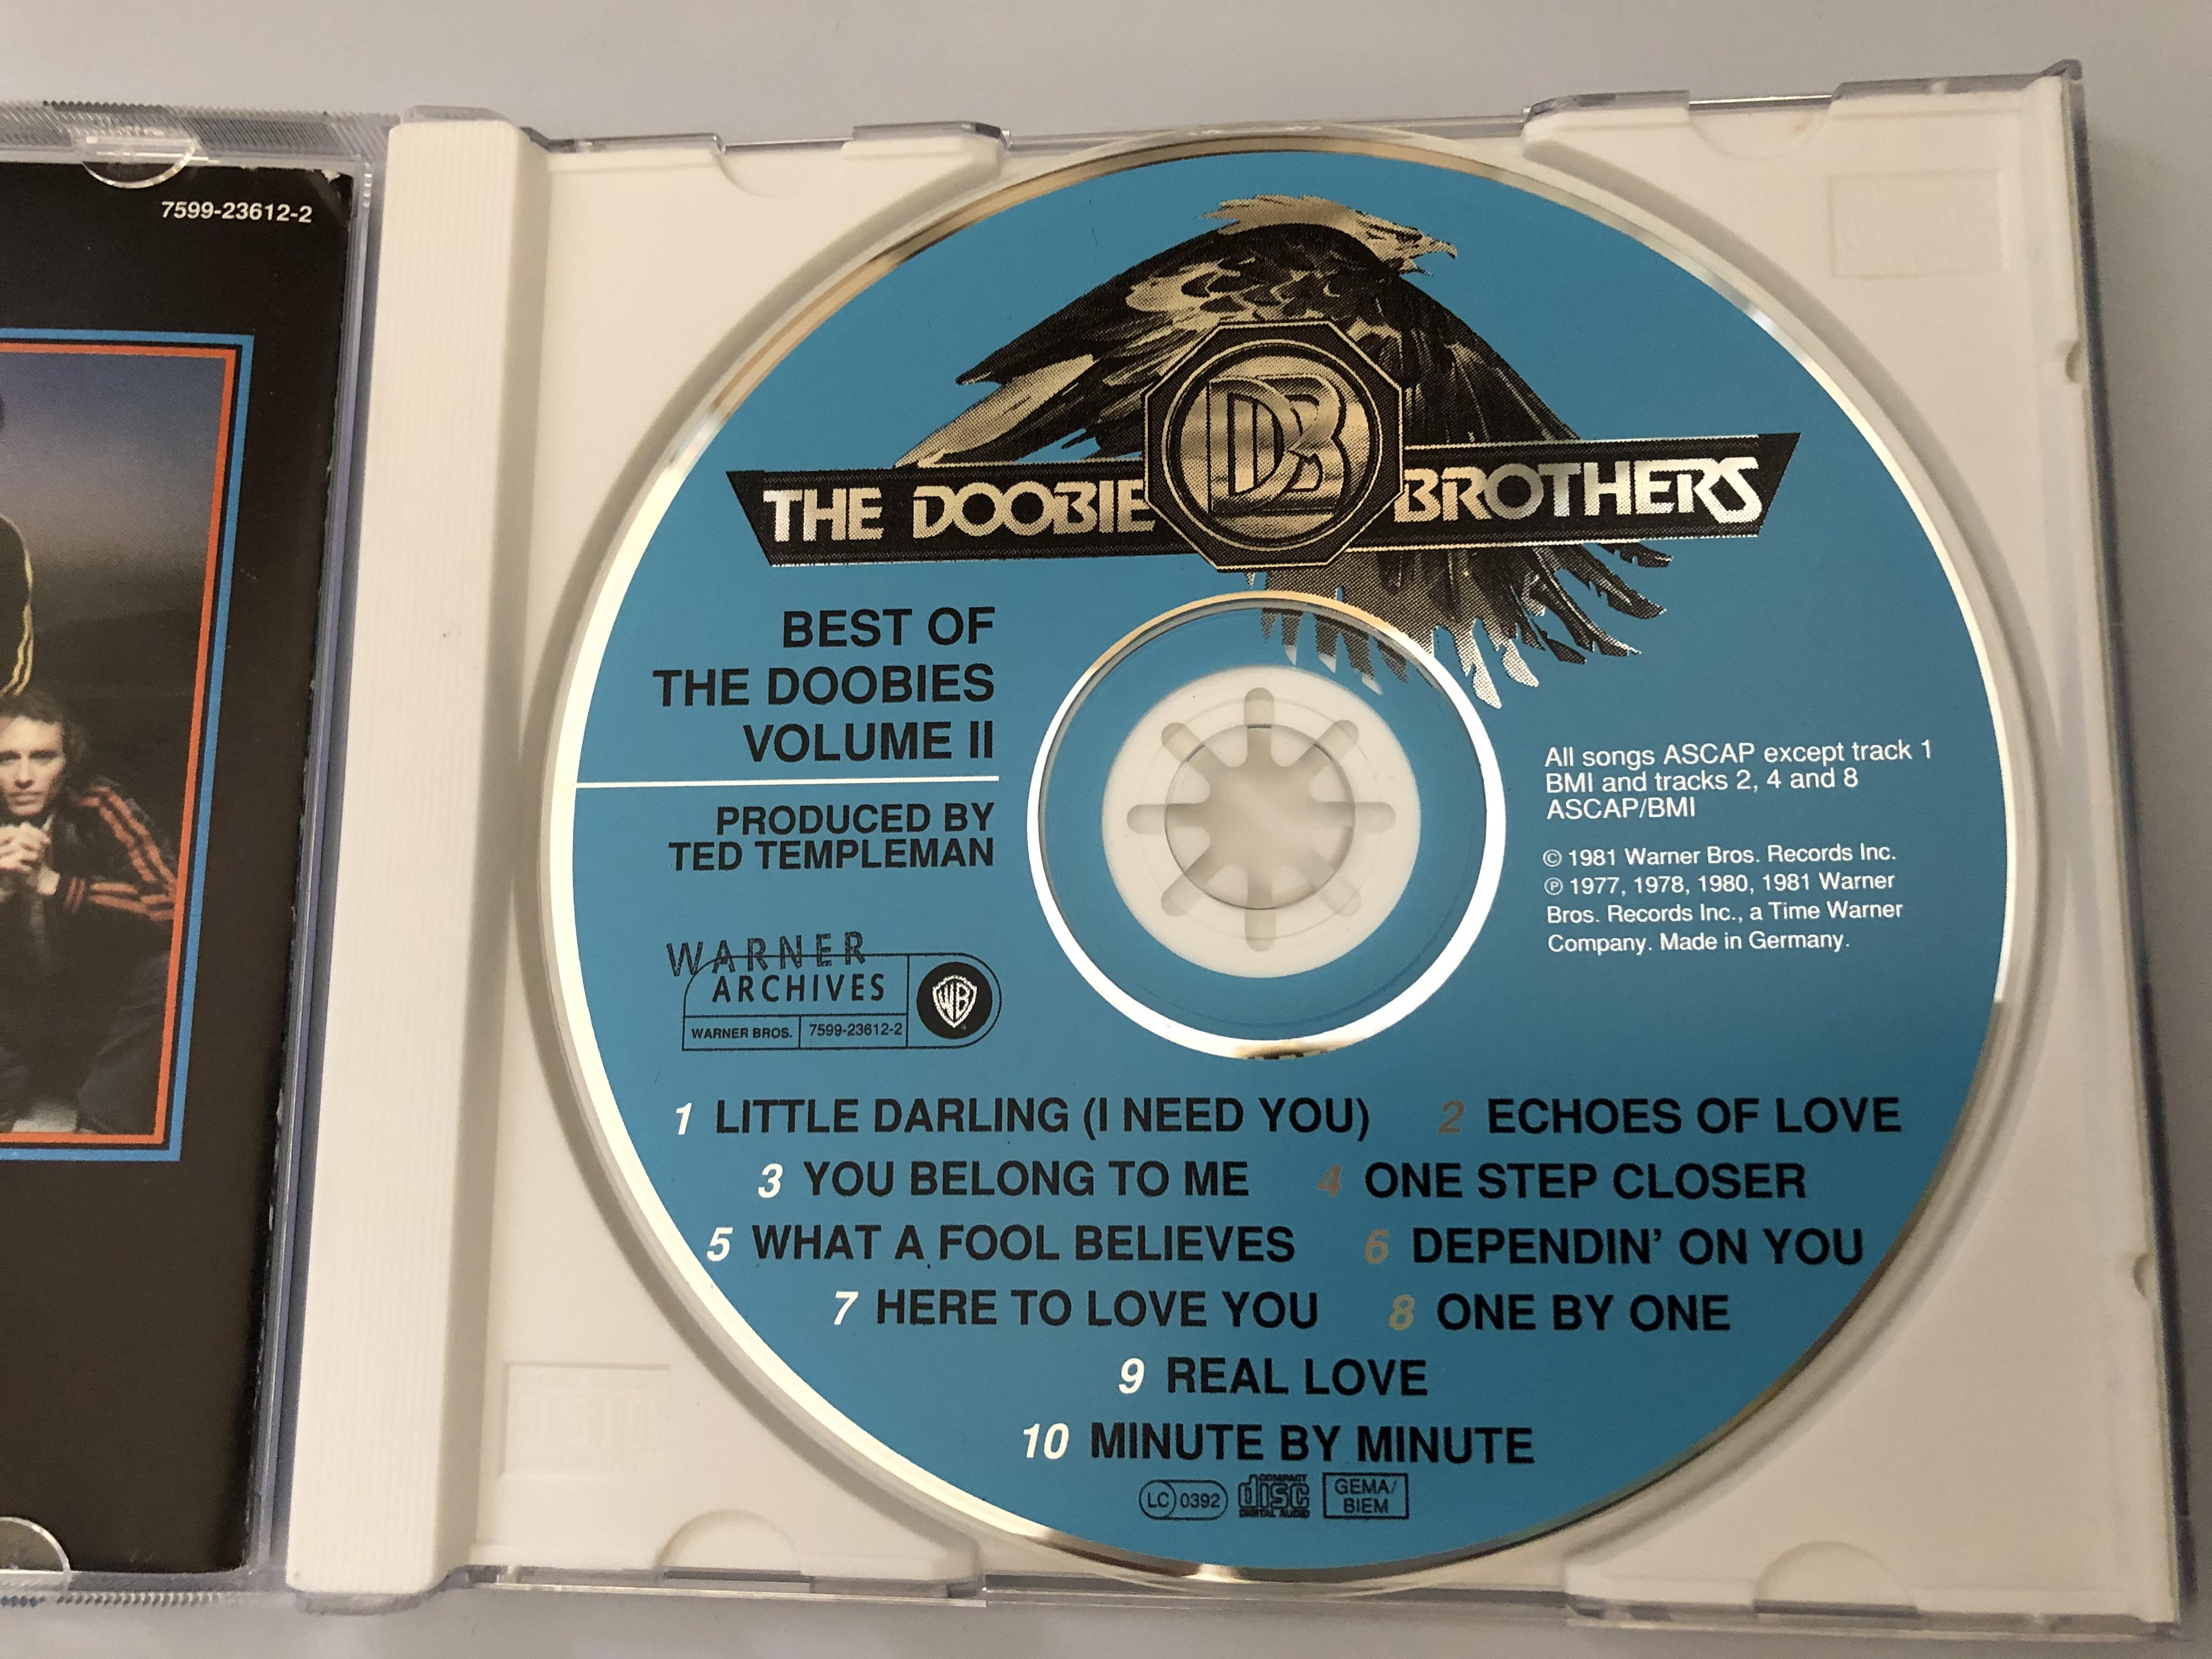 the-doobie-brothers-best-of-the-doobie-volume-ii-warner-archives-audio-cd-7599-23612-2-6-.jpg